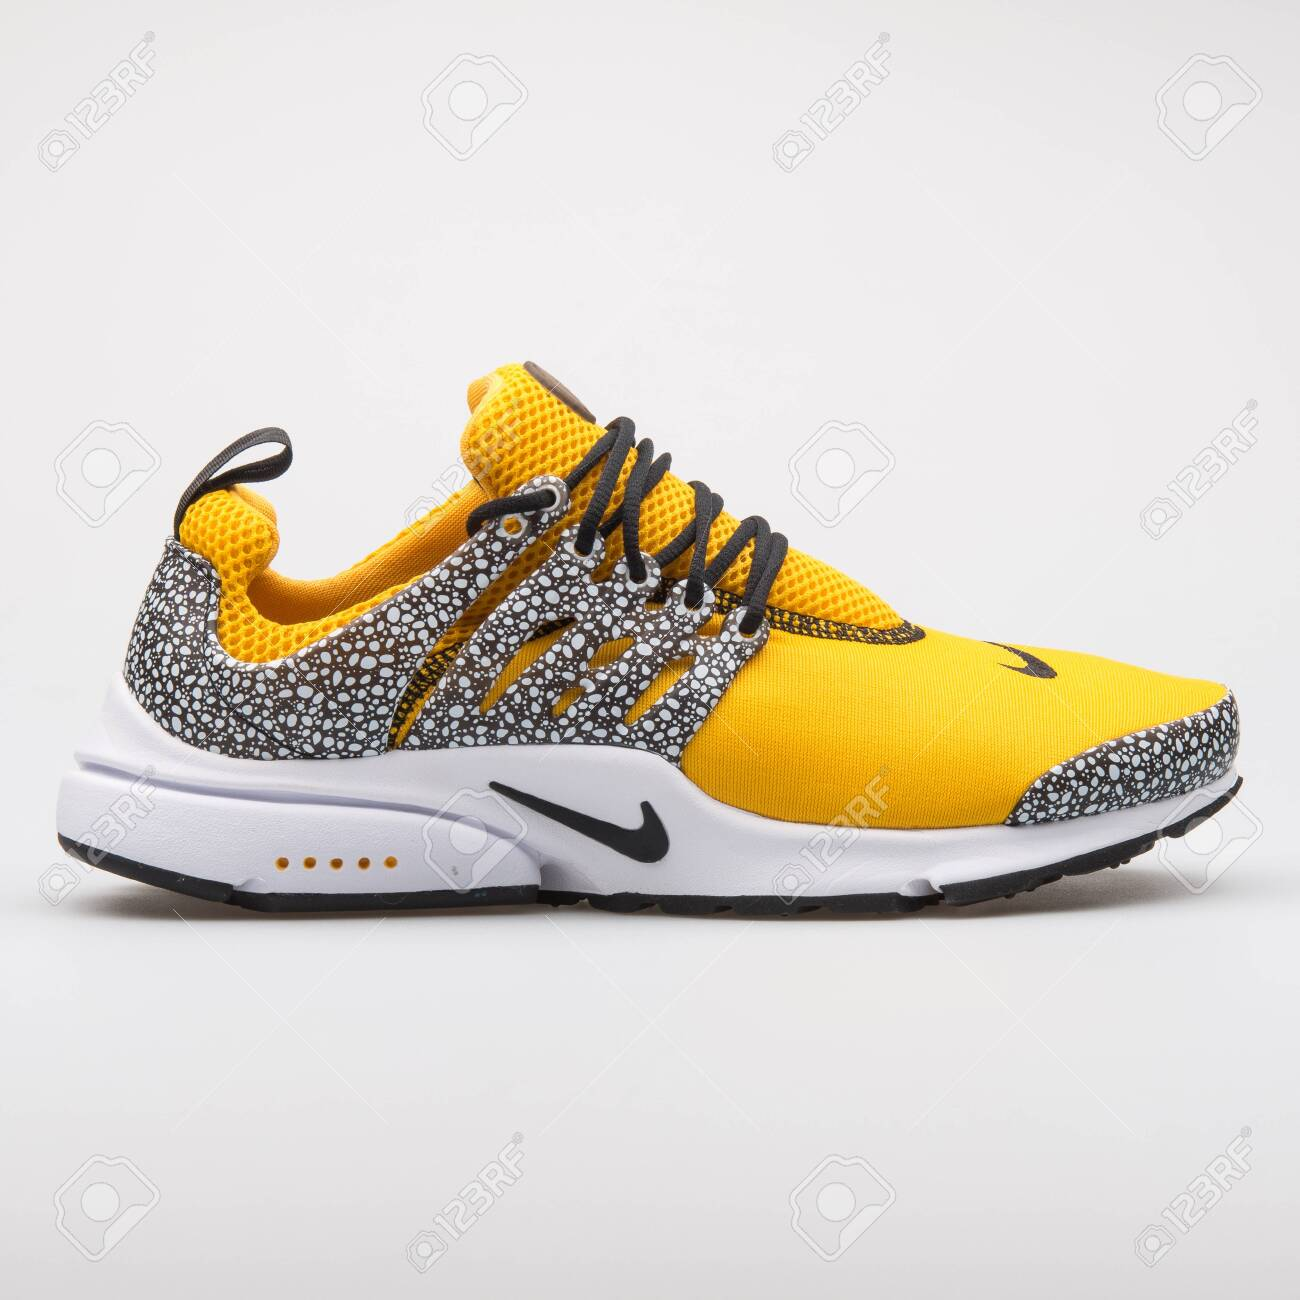 pretty cheap top fashion finest selection VIENNA, AUSTRIA - AUGUST 7, 2017: Nike Air Presto QS yellow and..